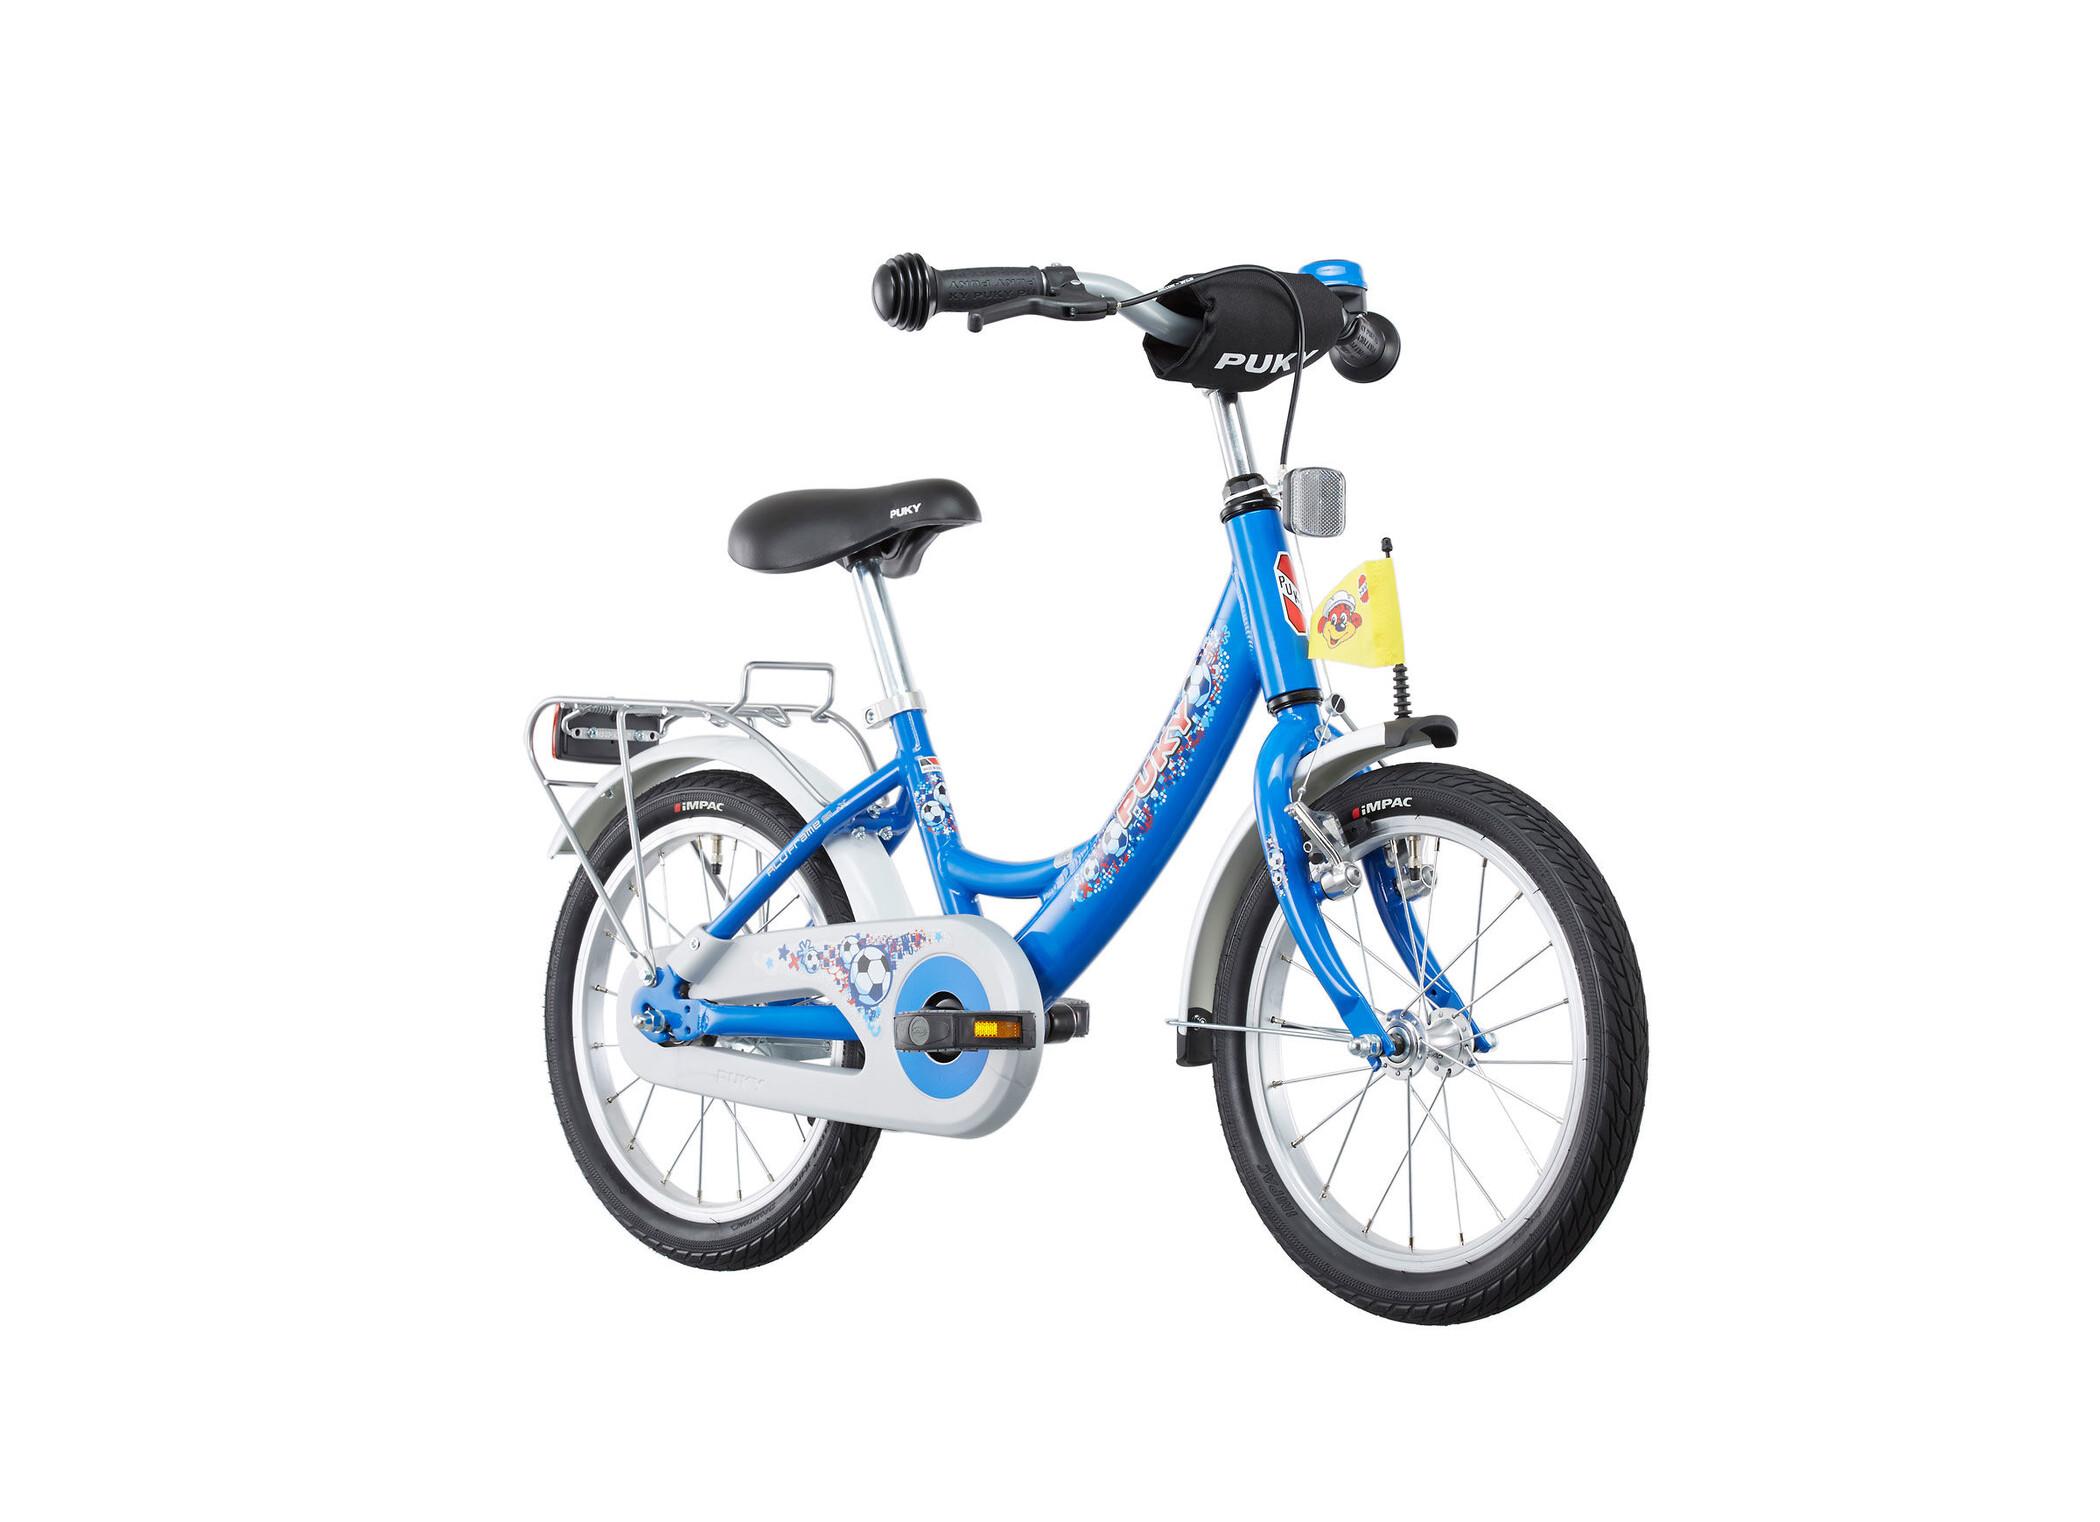 Puky ZL 16 1 Alu Fahrrad 16